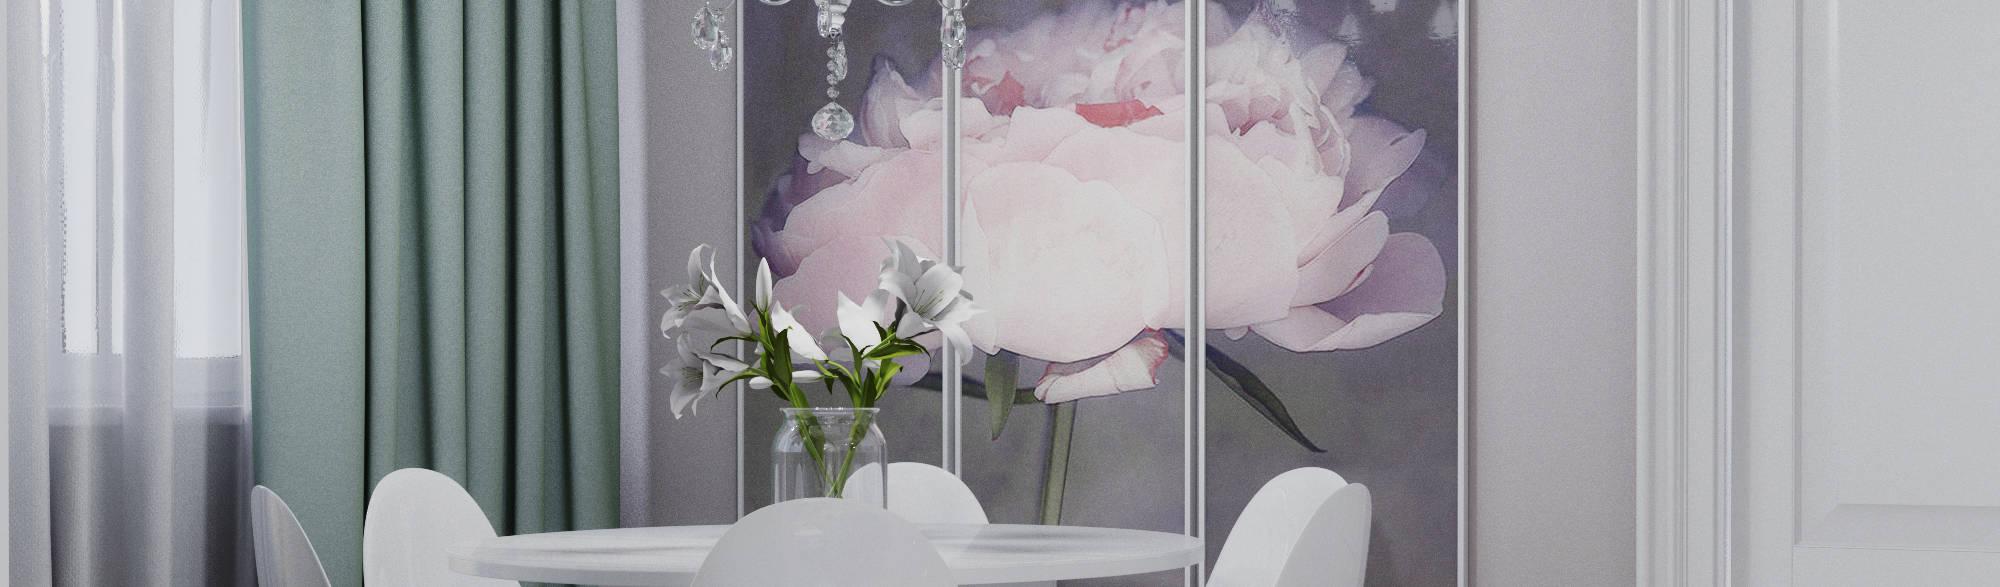 AlexLadanova interior design